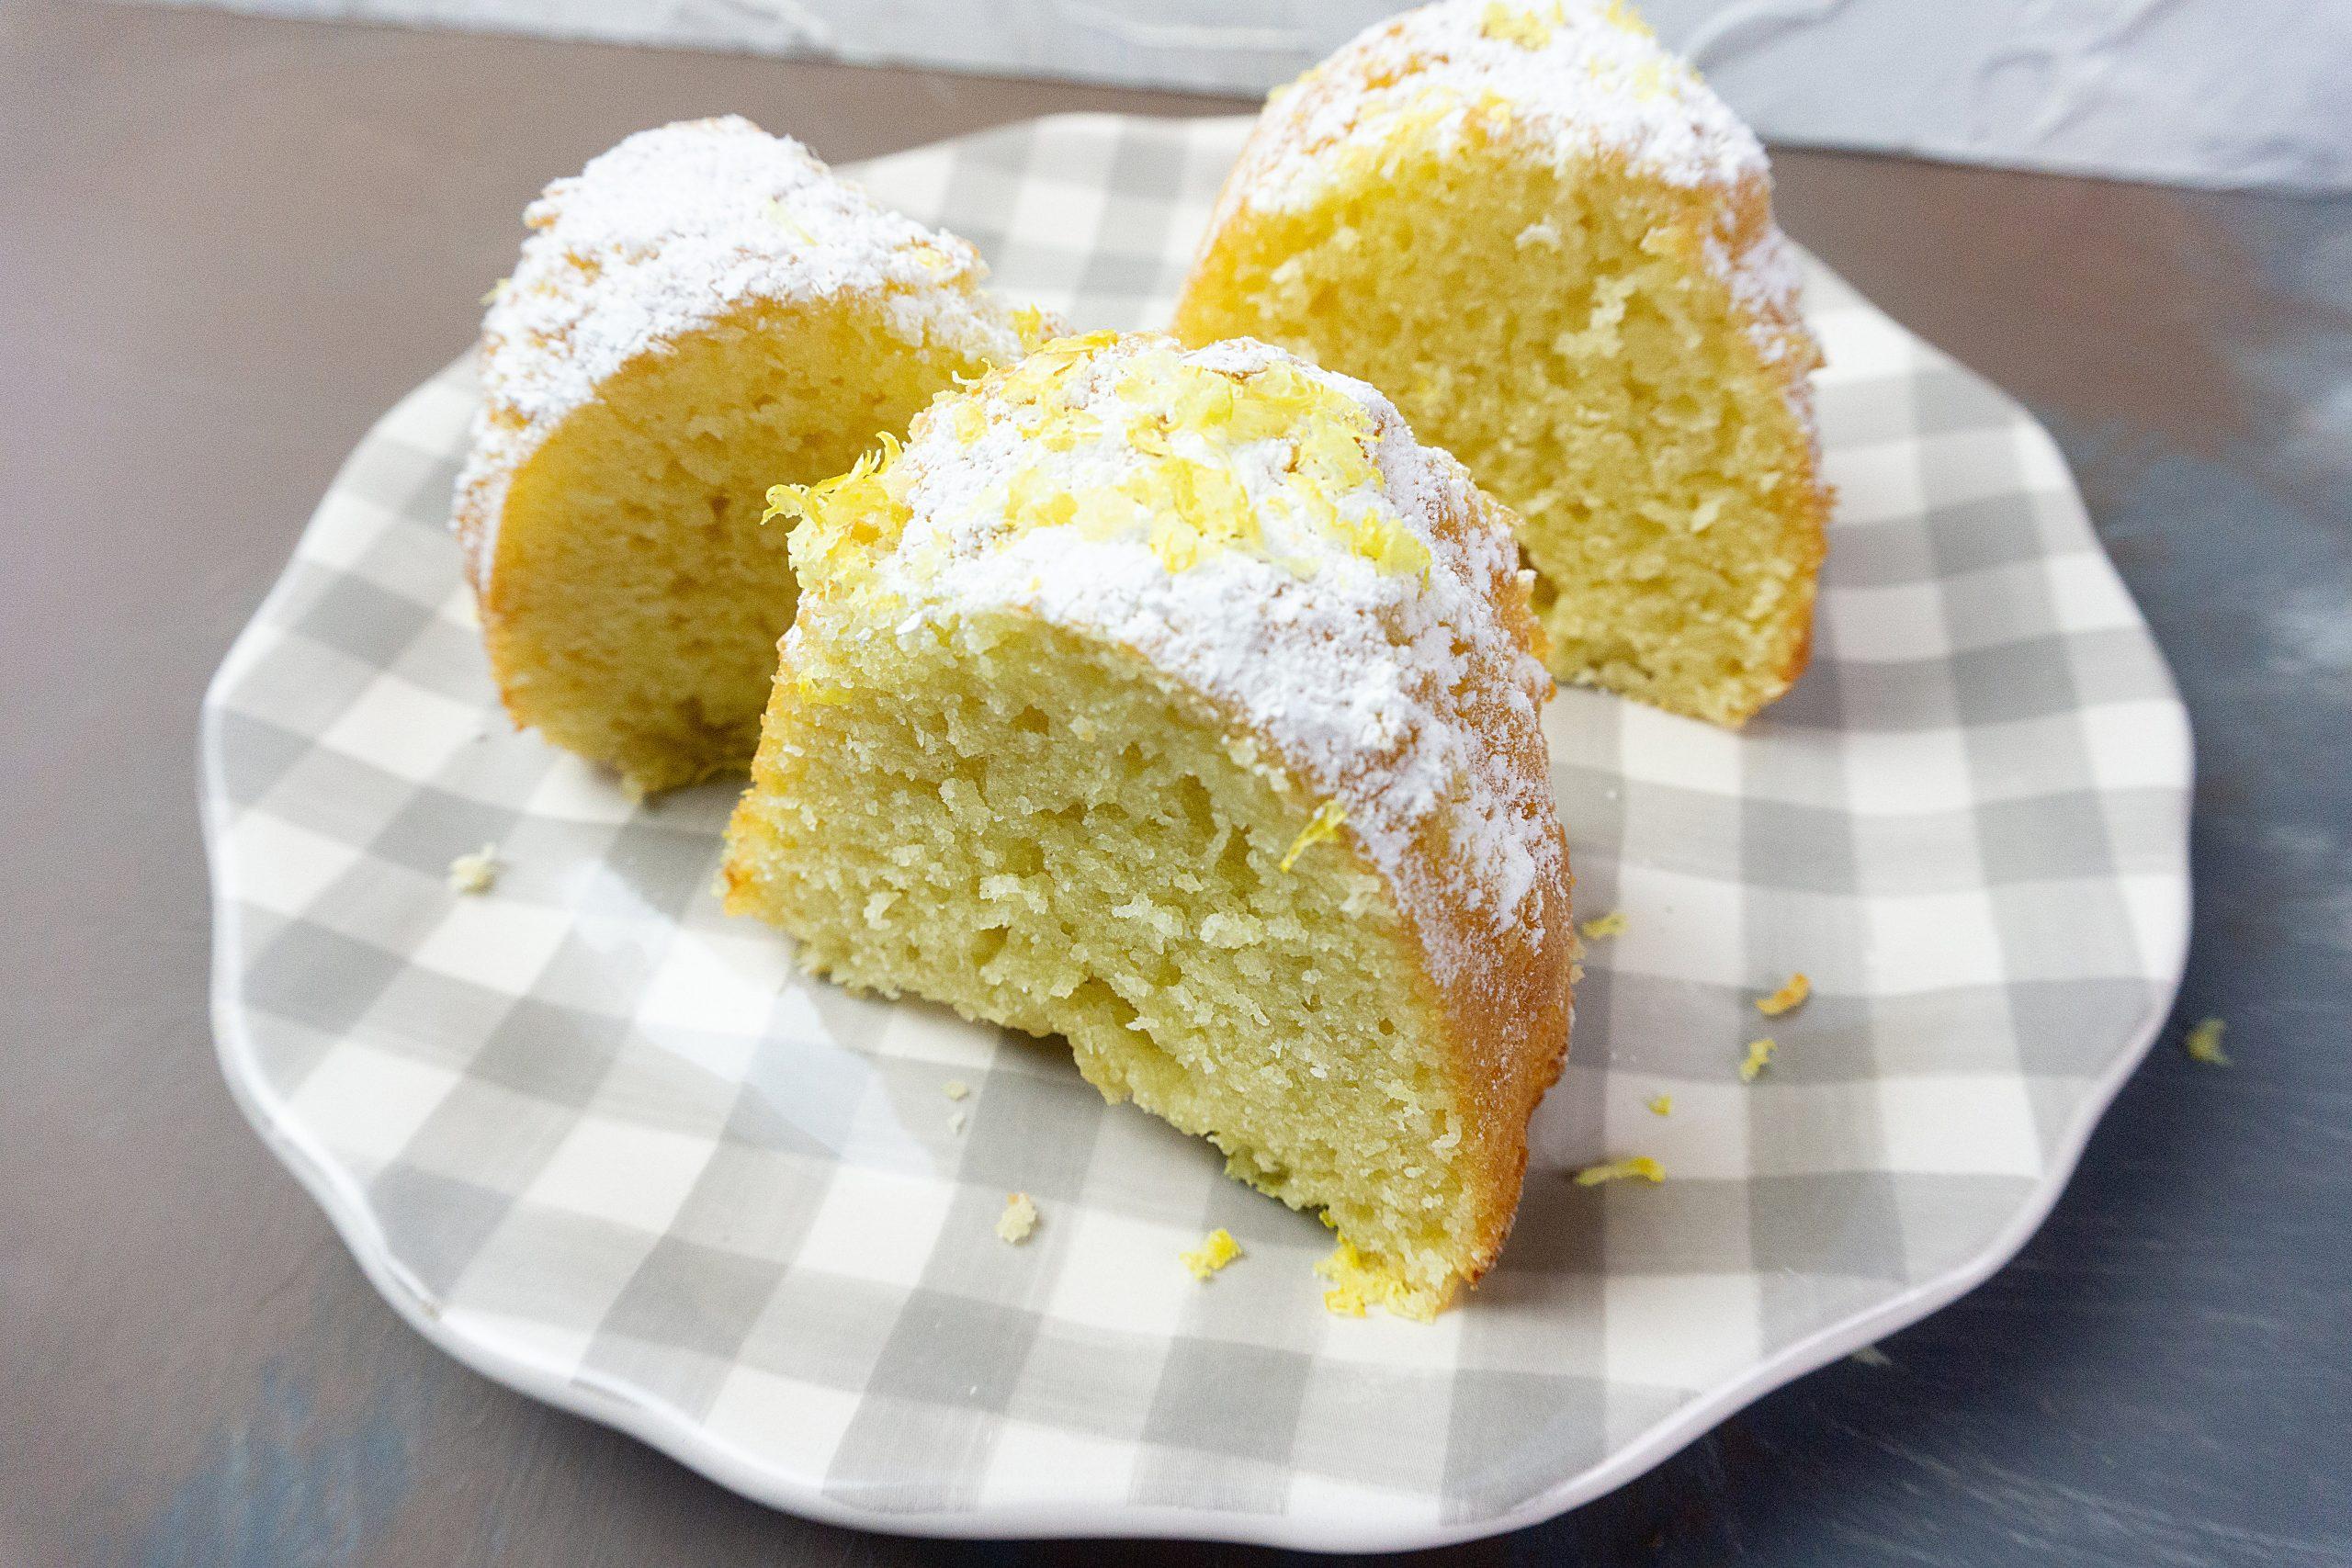 Meyer Lemon Bundt Cake on a grey and white checkered plate.